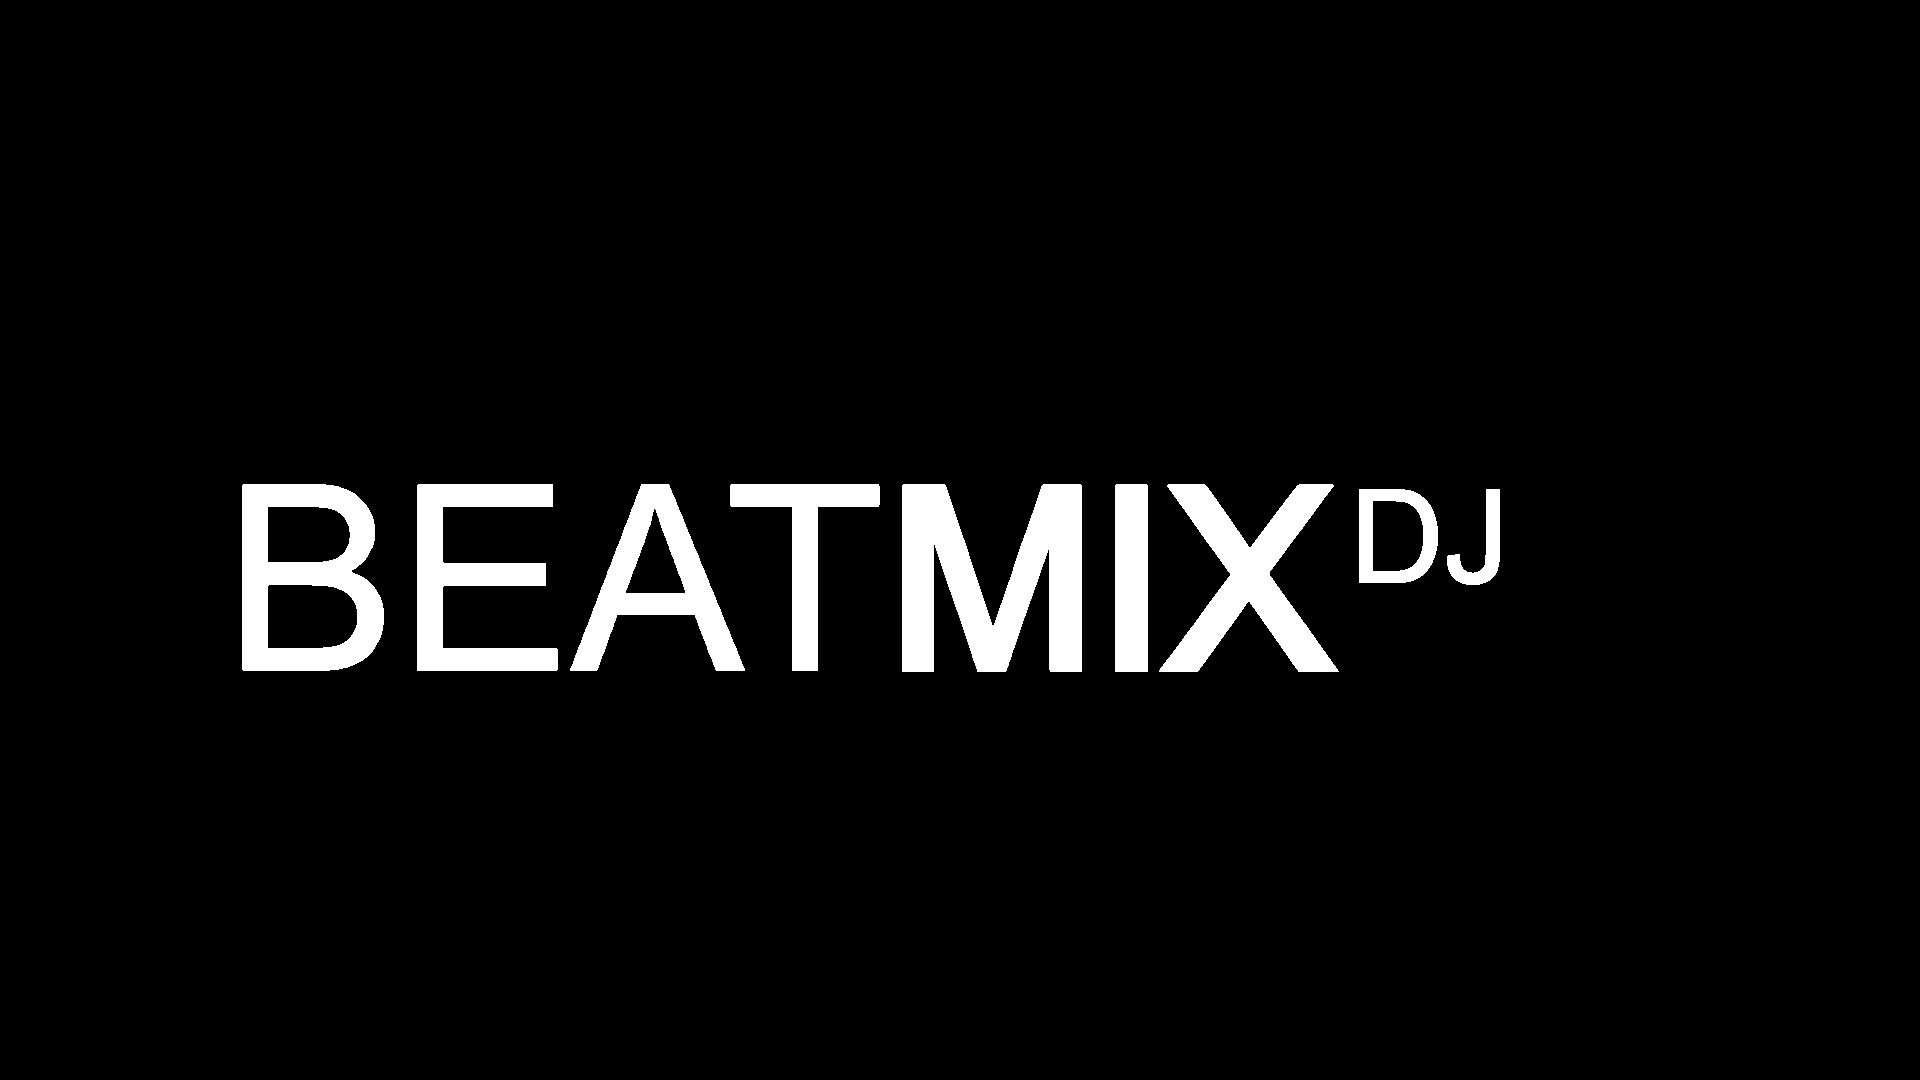 beatmix dj